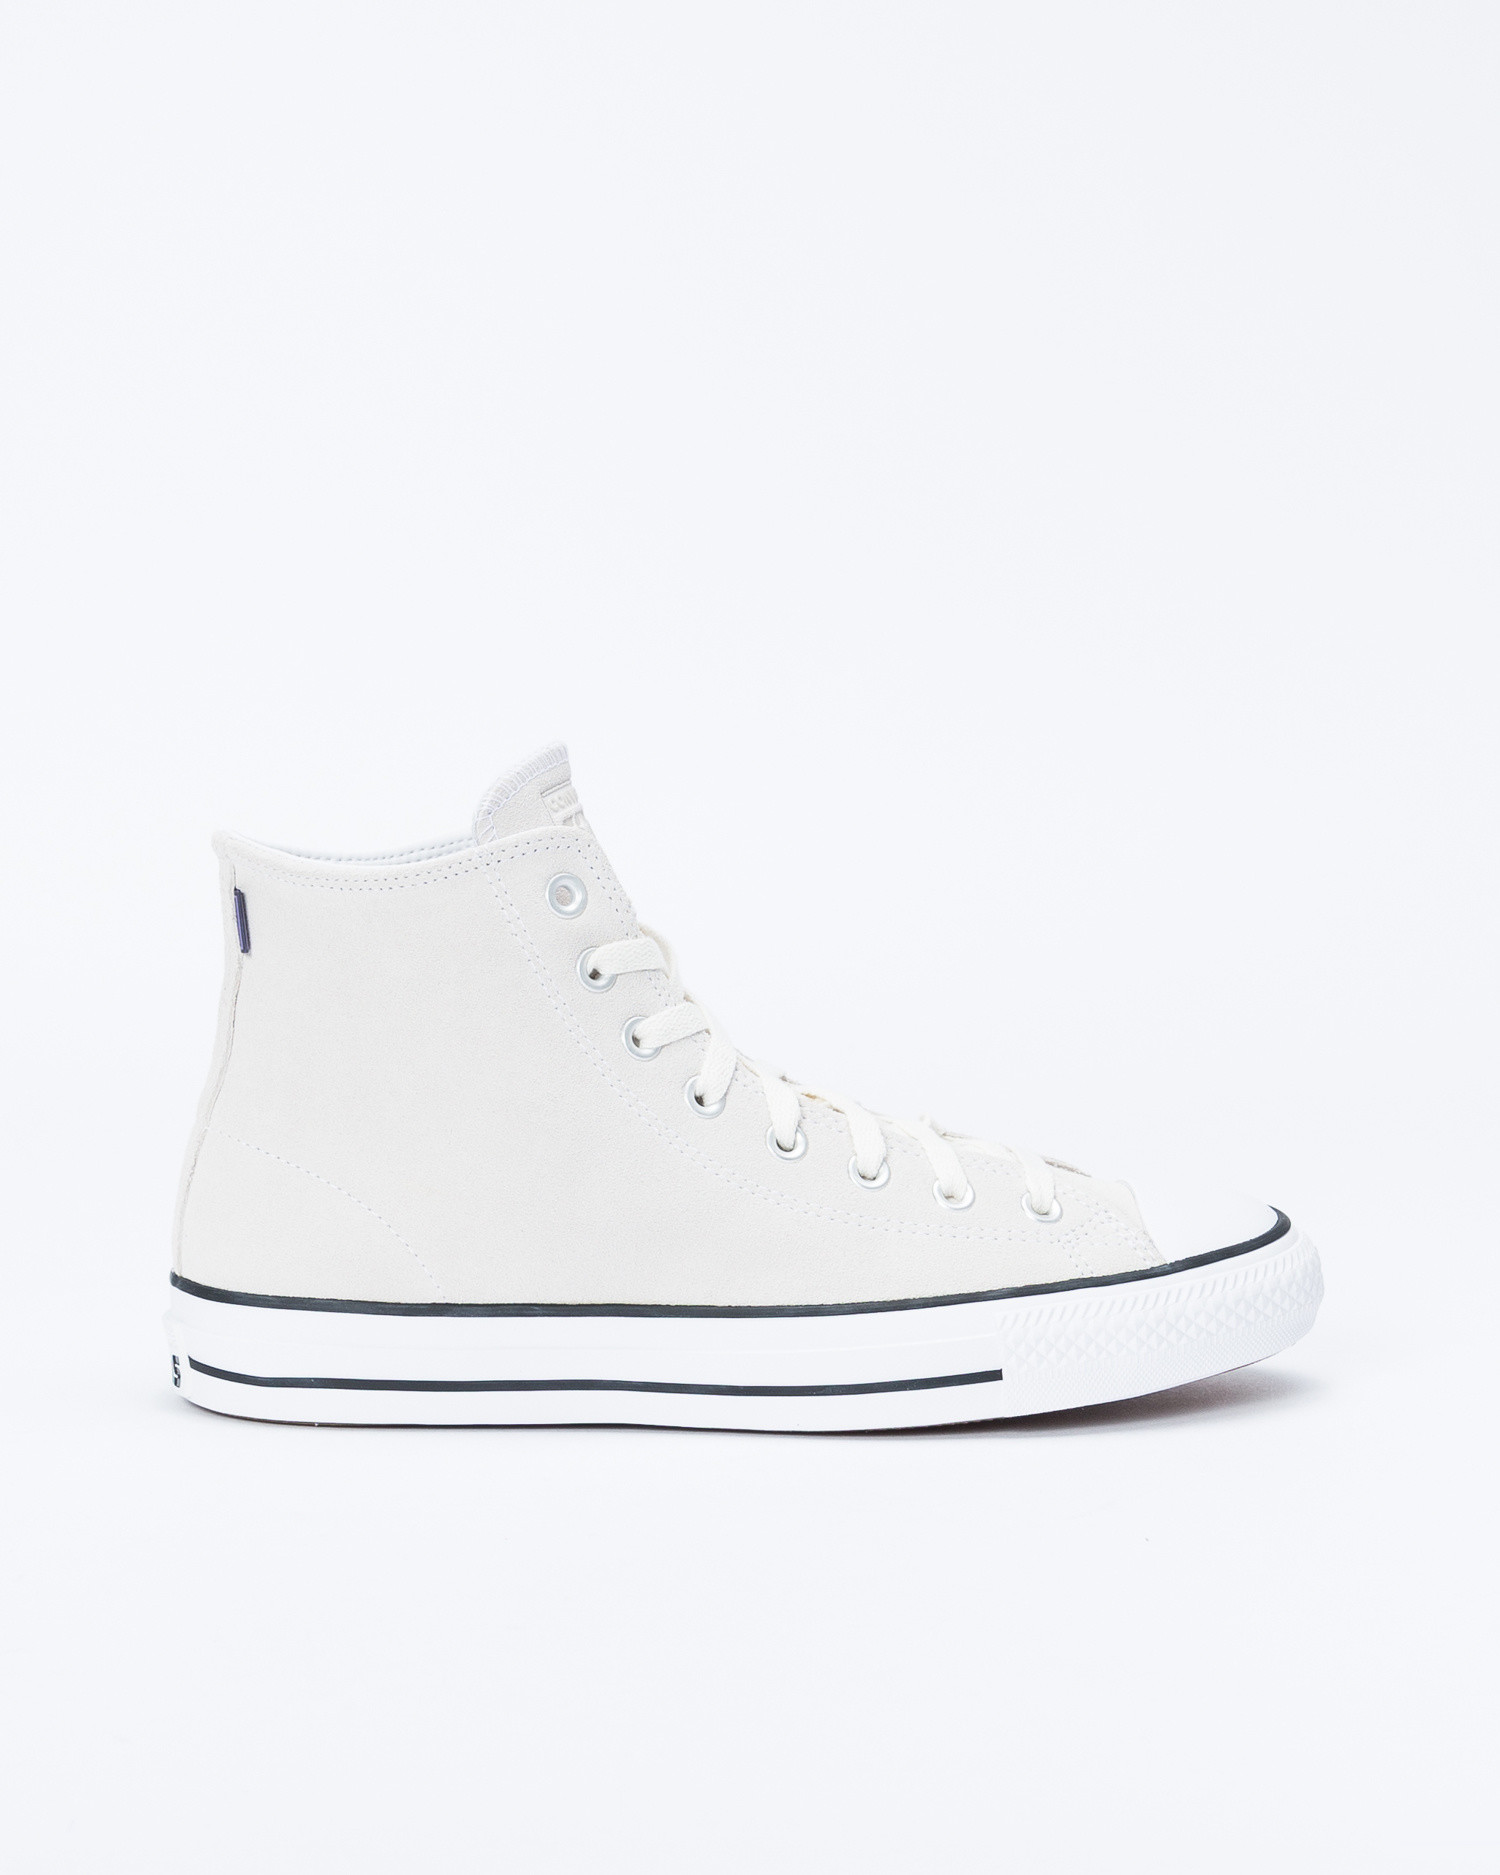 Converse Chuck Taylor All Star Pro Rubber Vintage White / White / Black